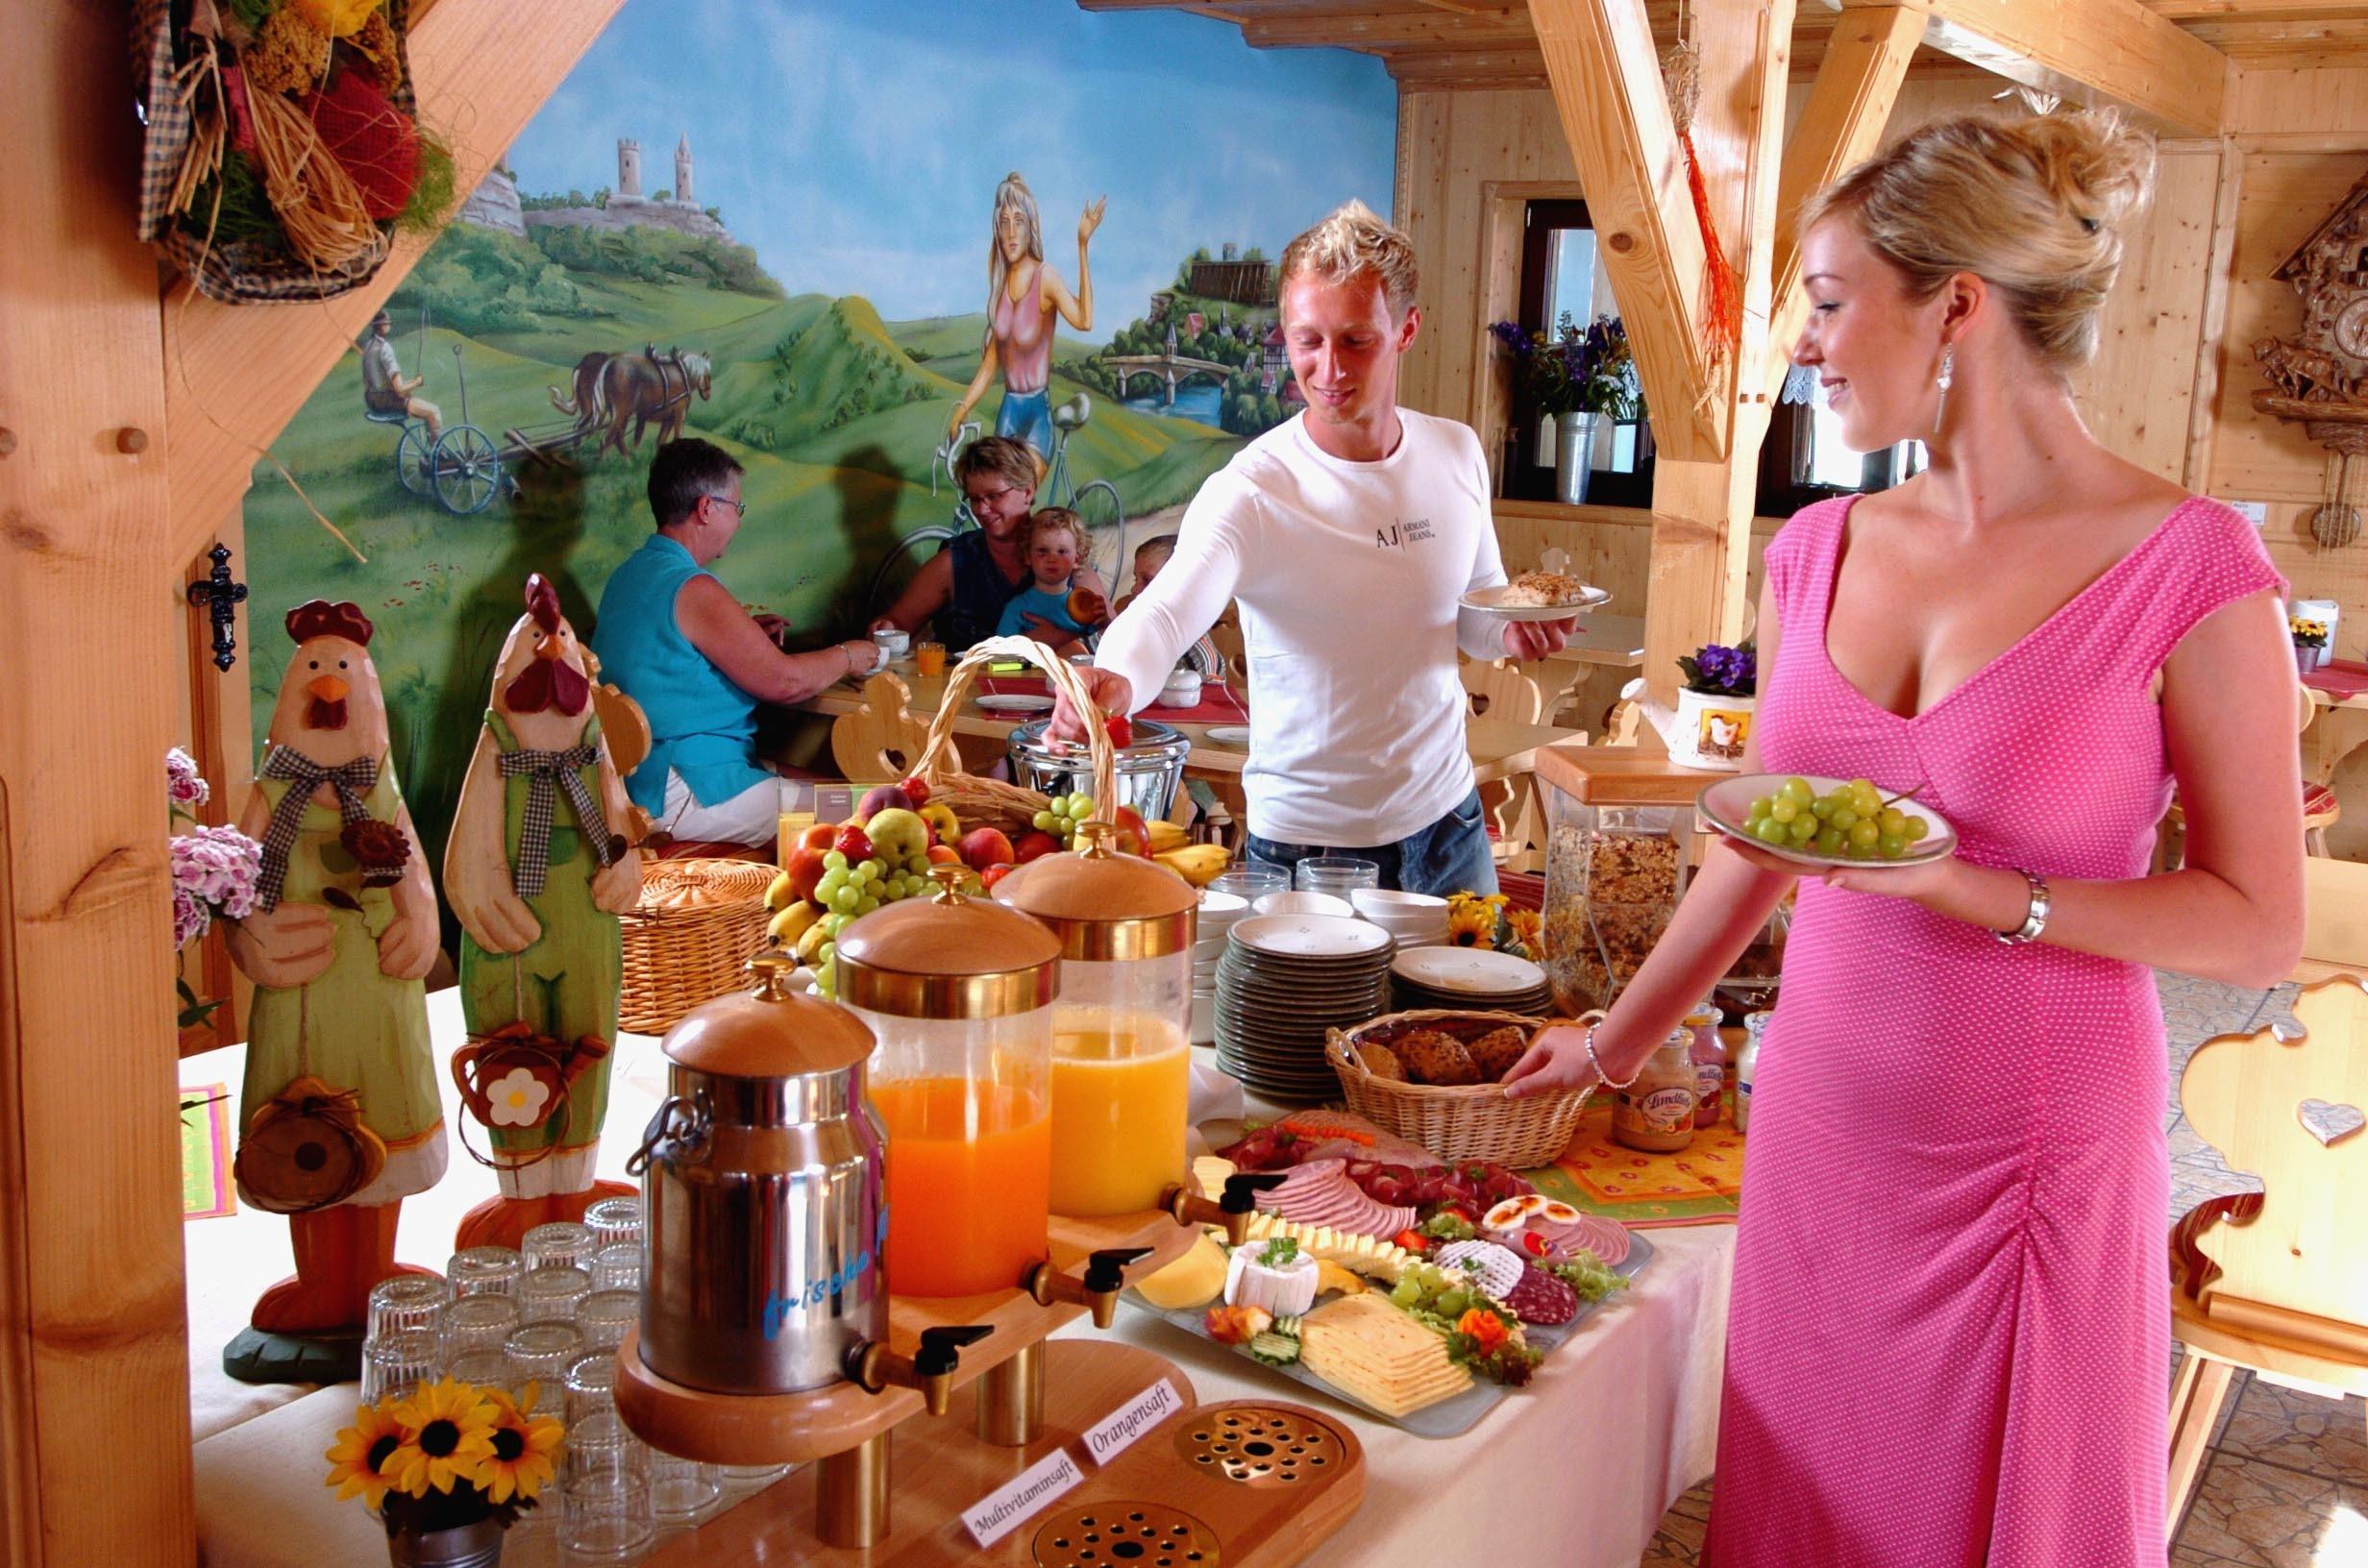 Impressionskategorie: Das Restaurant